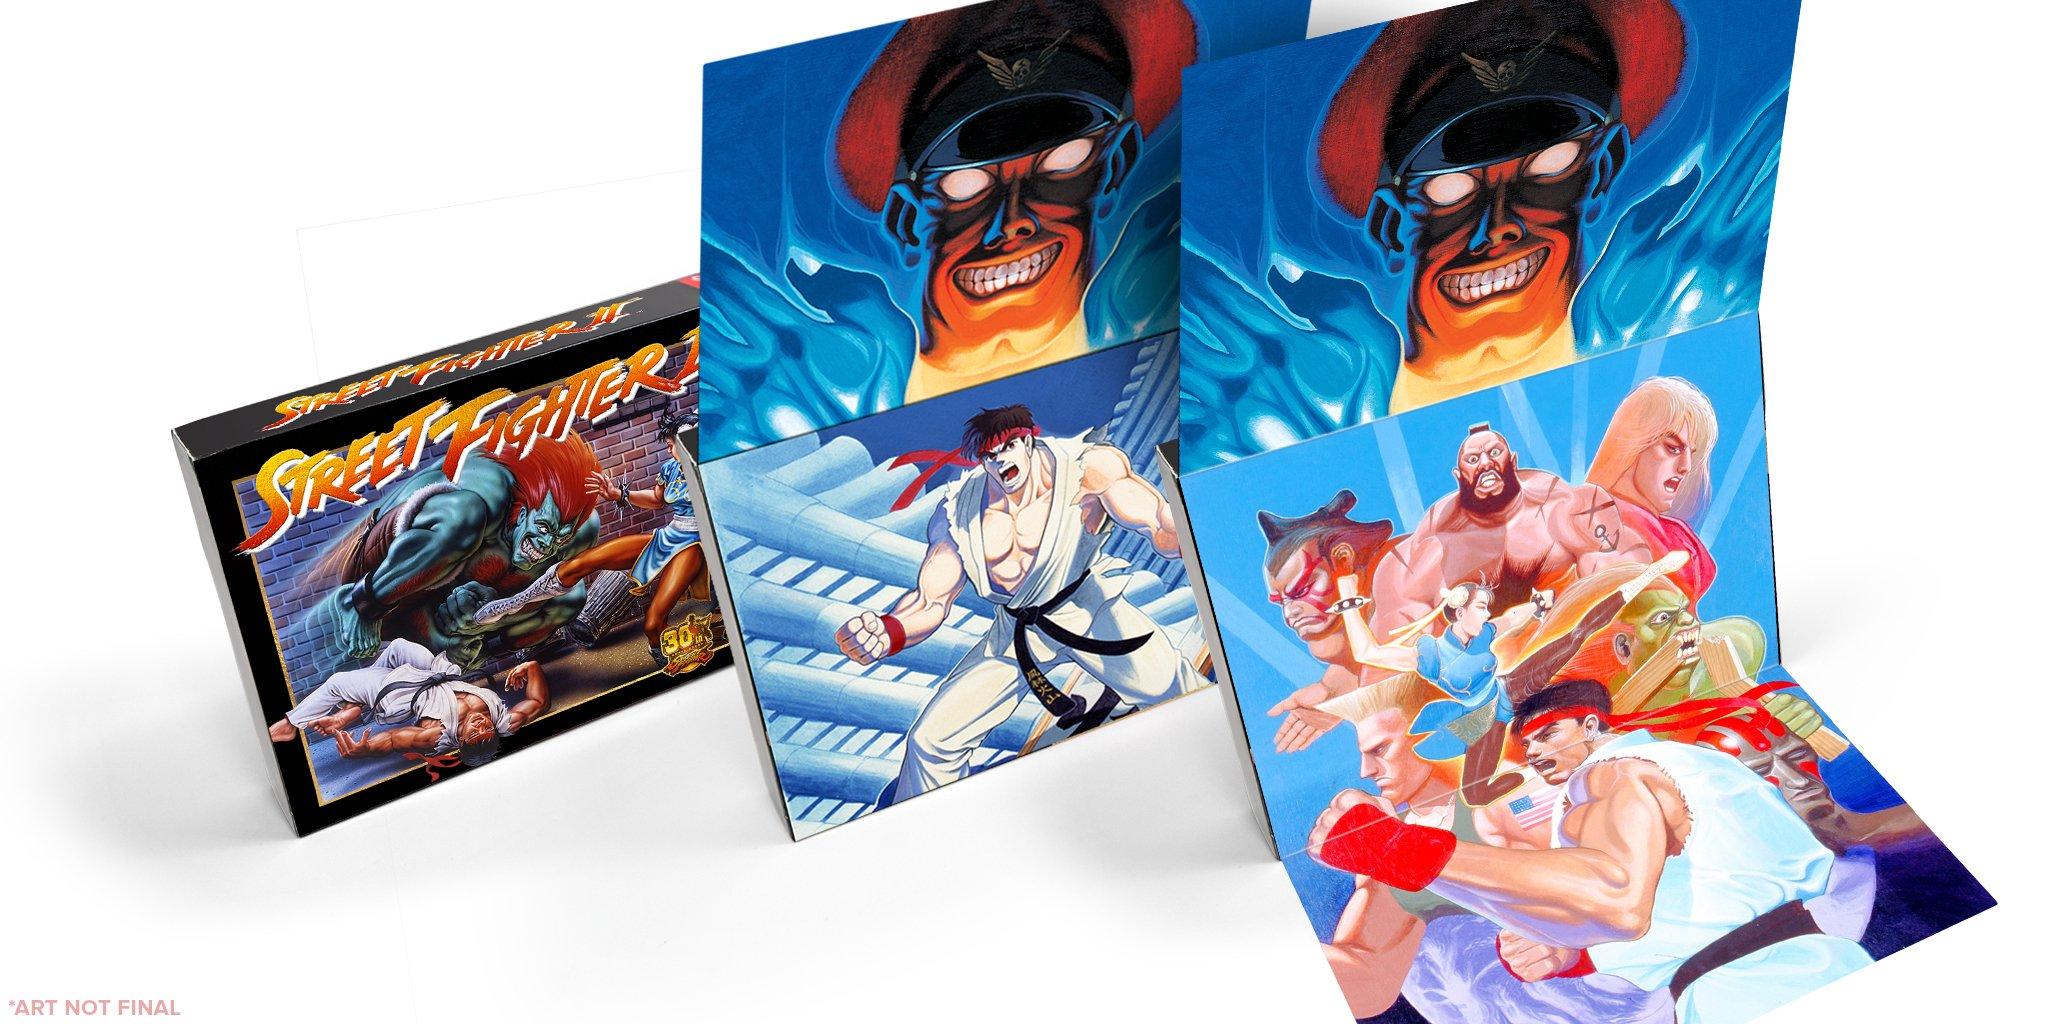 Capcom re-releasing Street Fighter 2 on SNES cartridge - Polygon